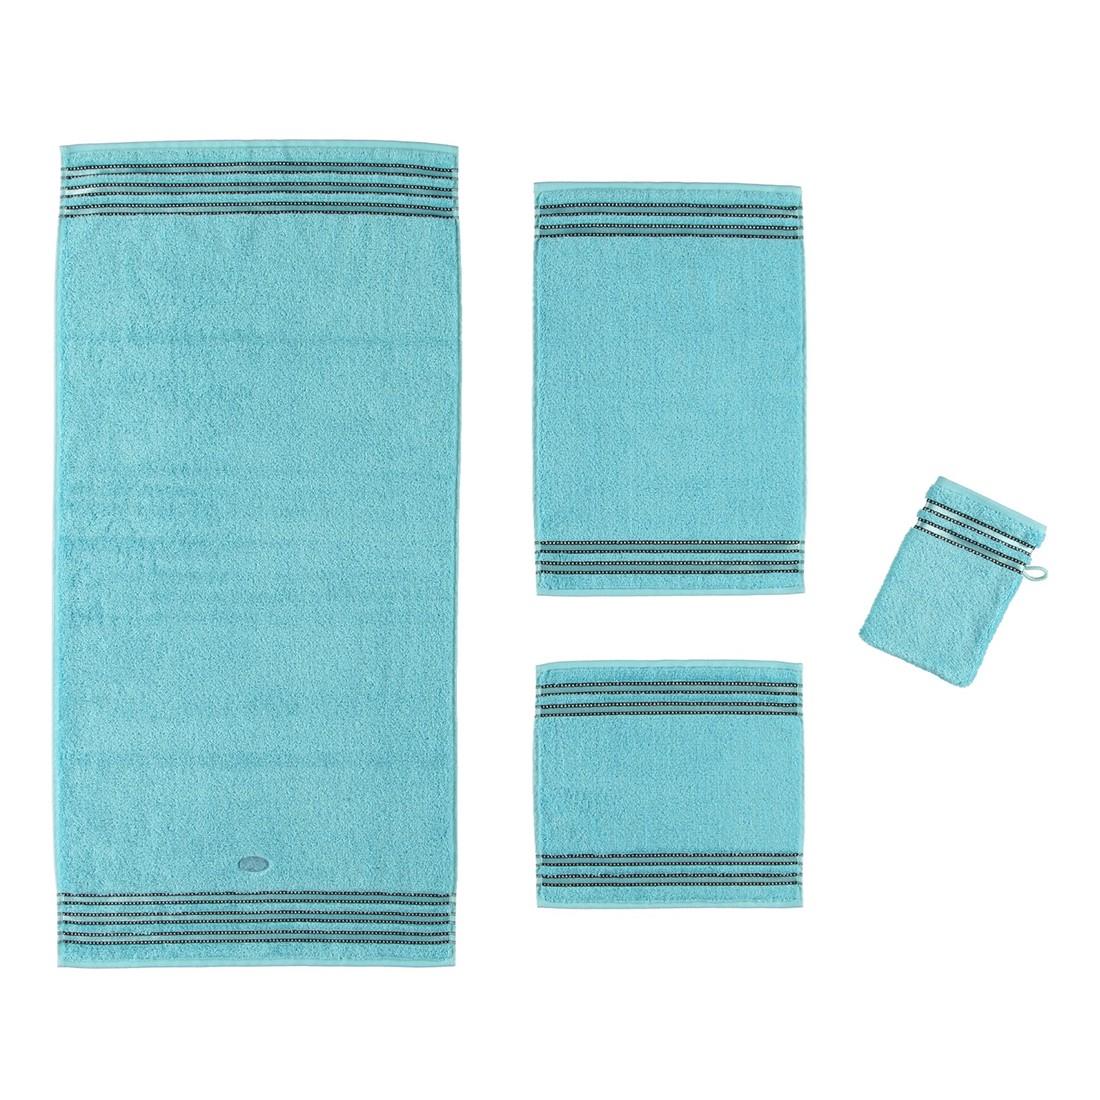 Handtuch Cult de Luxe – 100% Baumwolle light azure – 534 – Handtuch: 50 x 100 cm, Vossen günstig